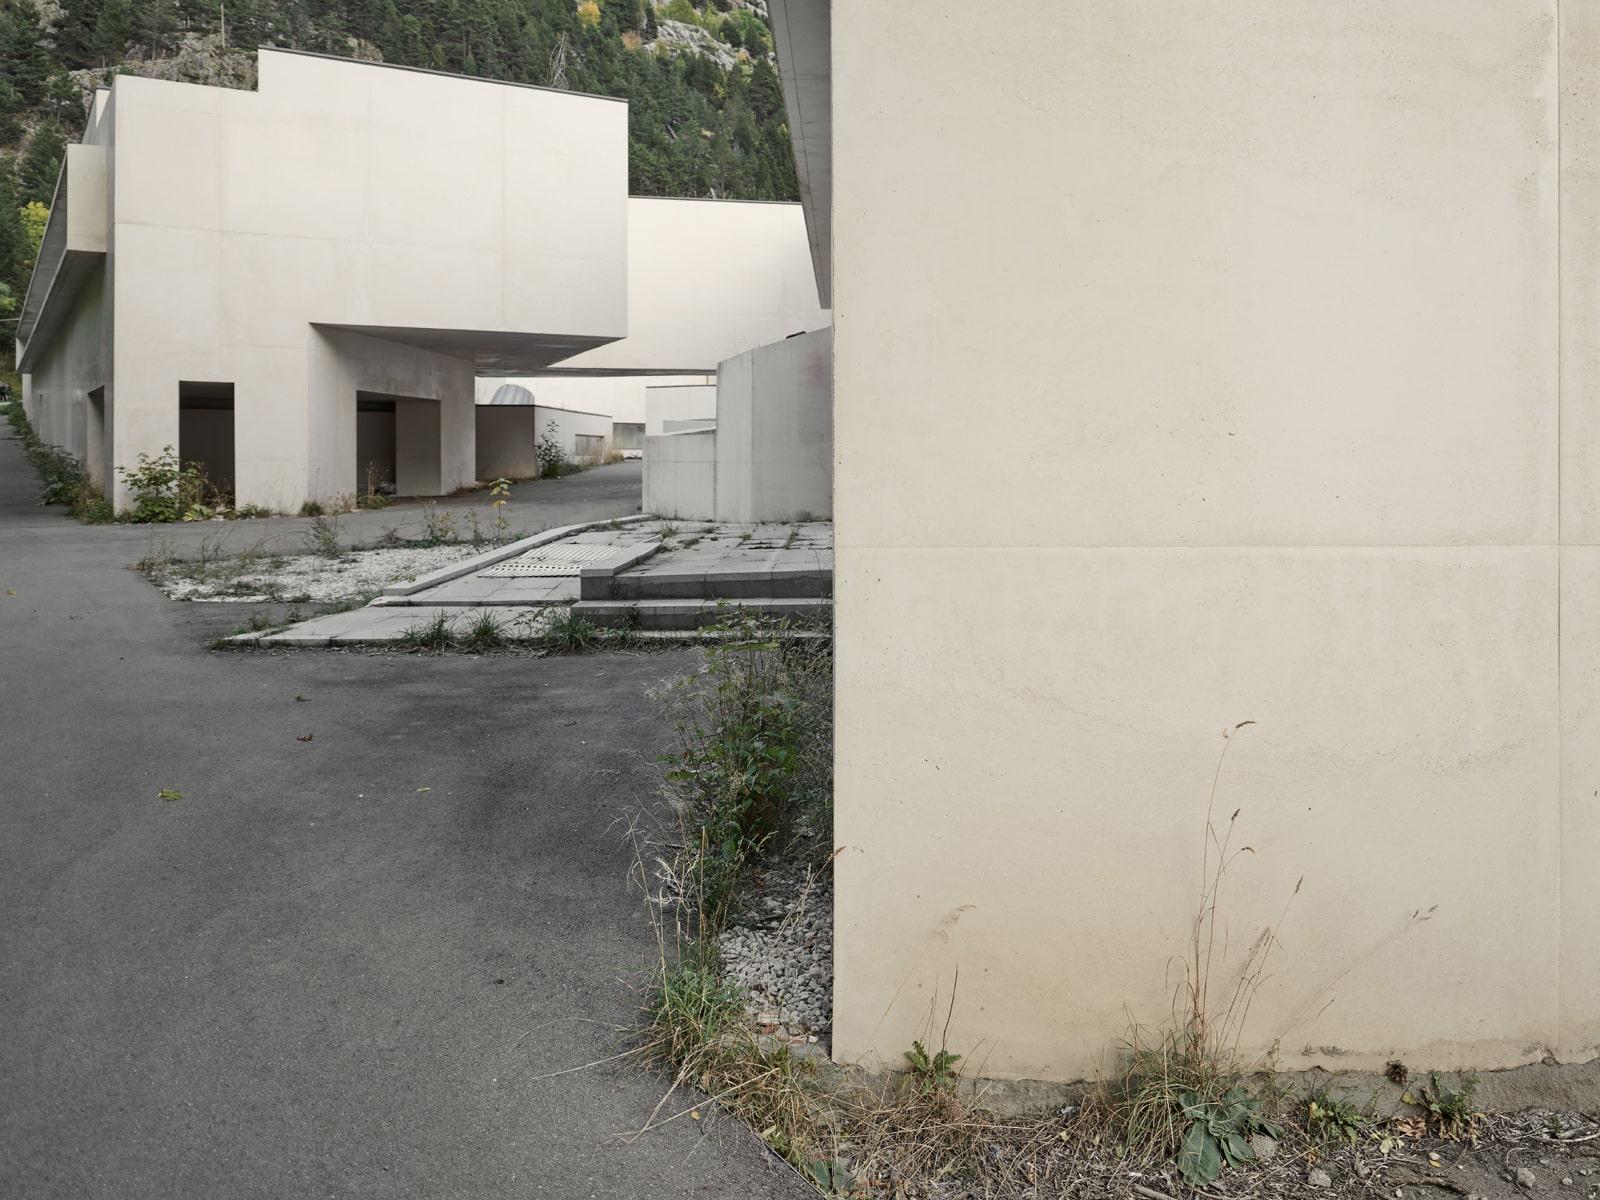 Poetics of Abandonment  - 20210918 InakiBergera Panticosa 9 62